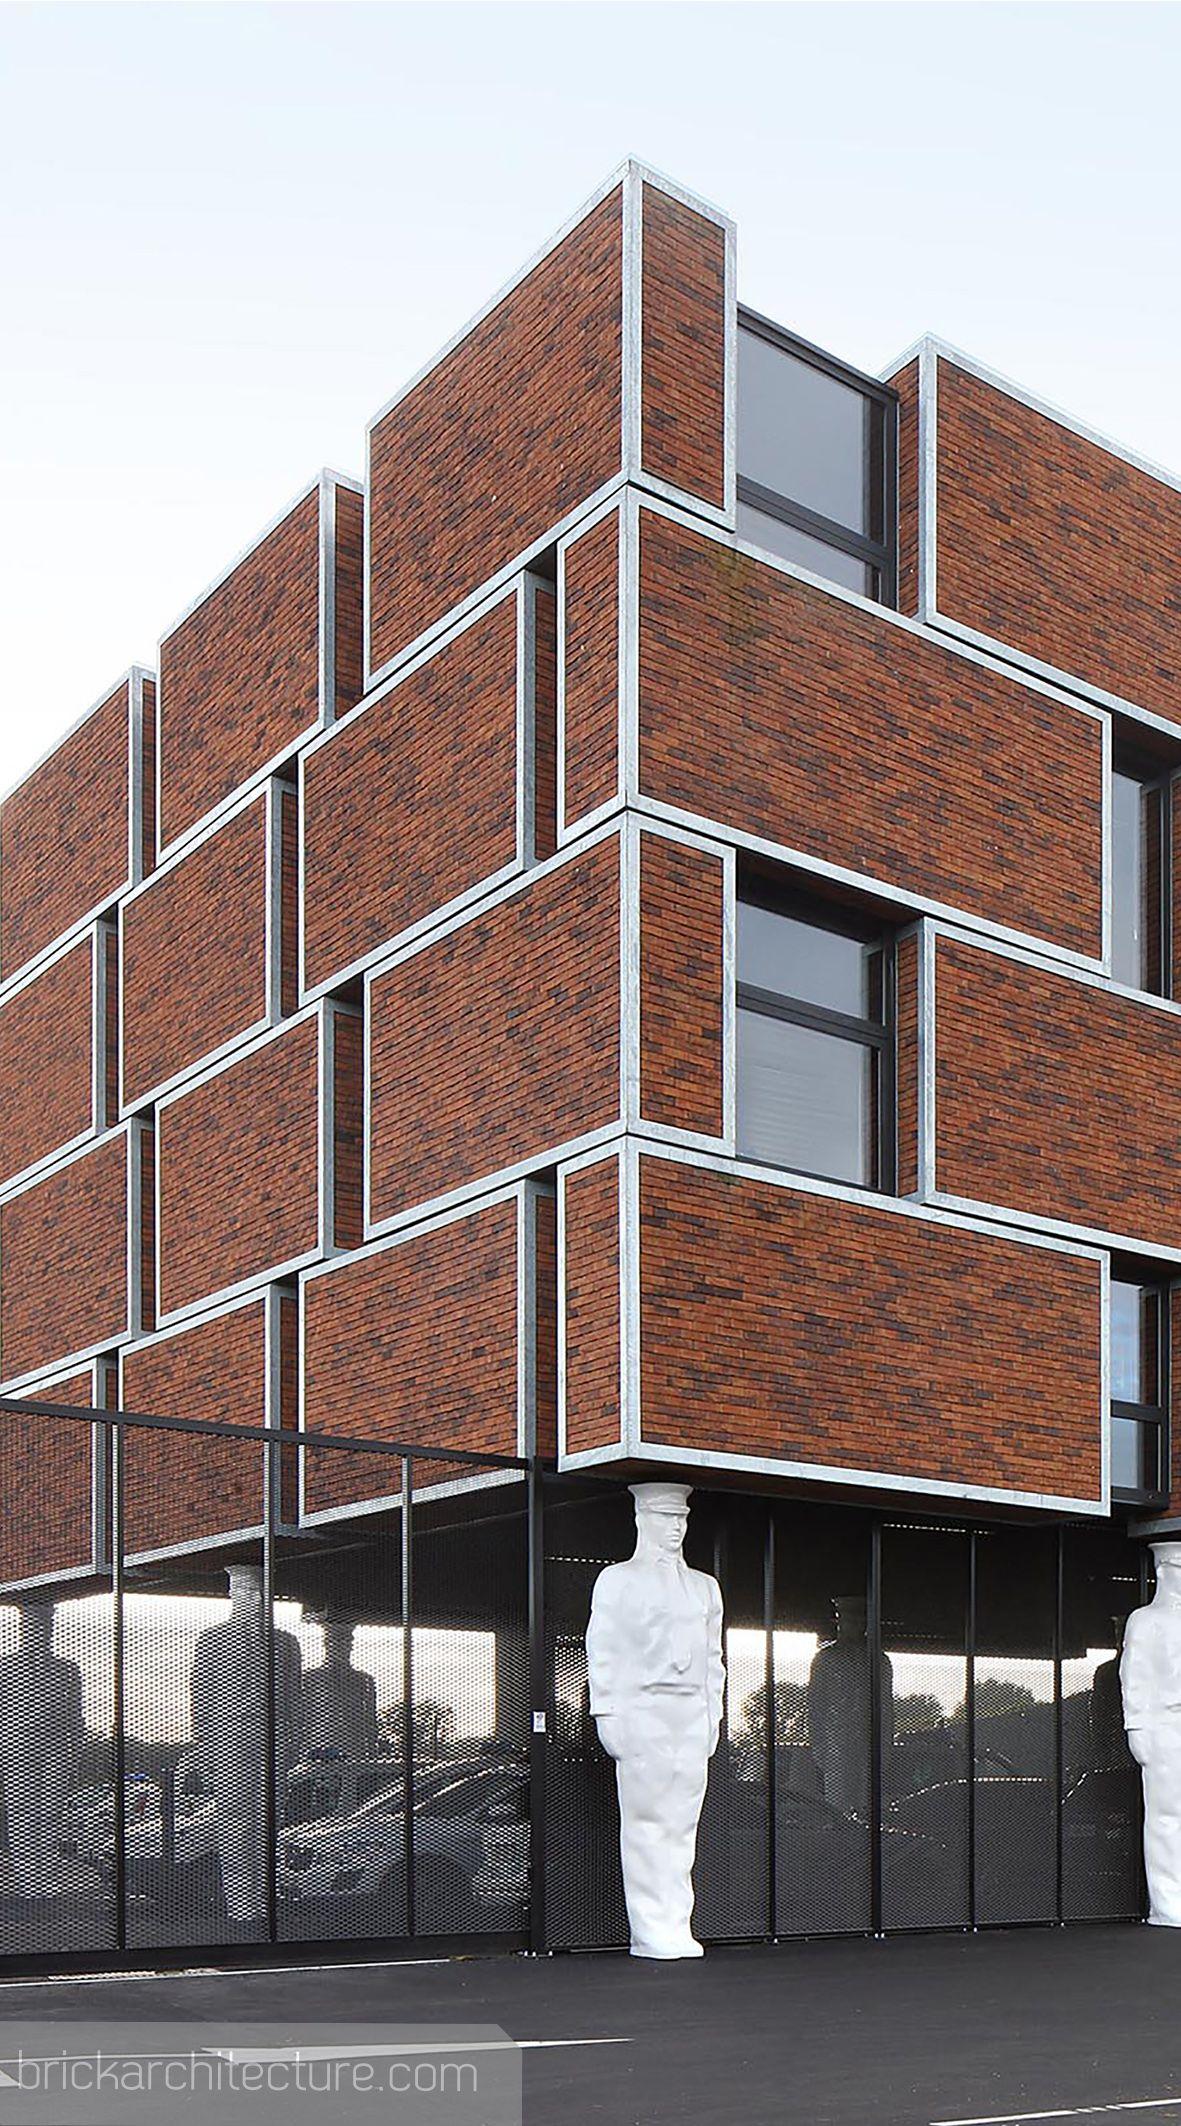 Mete Oz Adli Kullanicinin Architecture Brick Works Panosundaki Pin